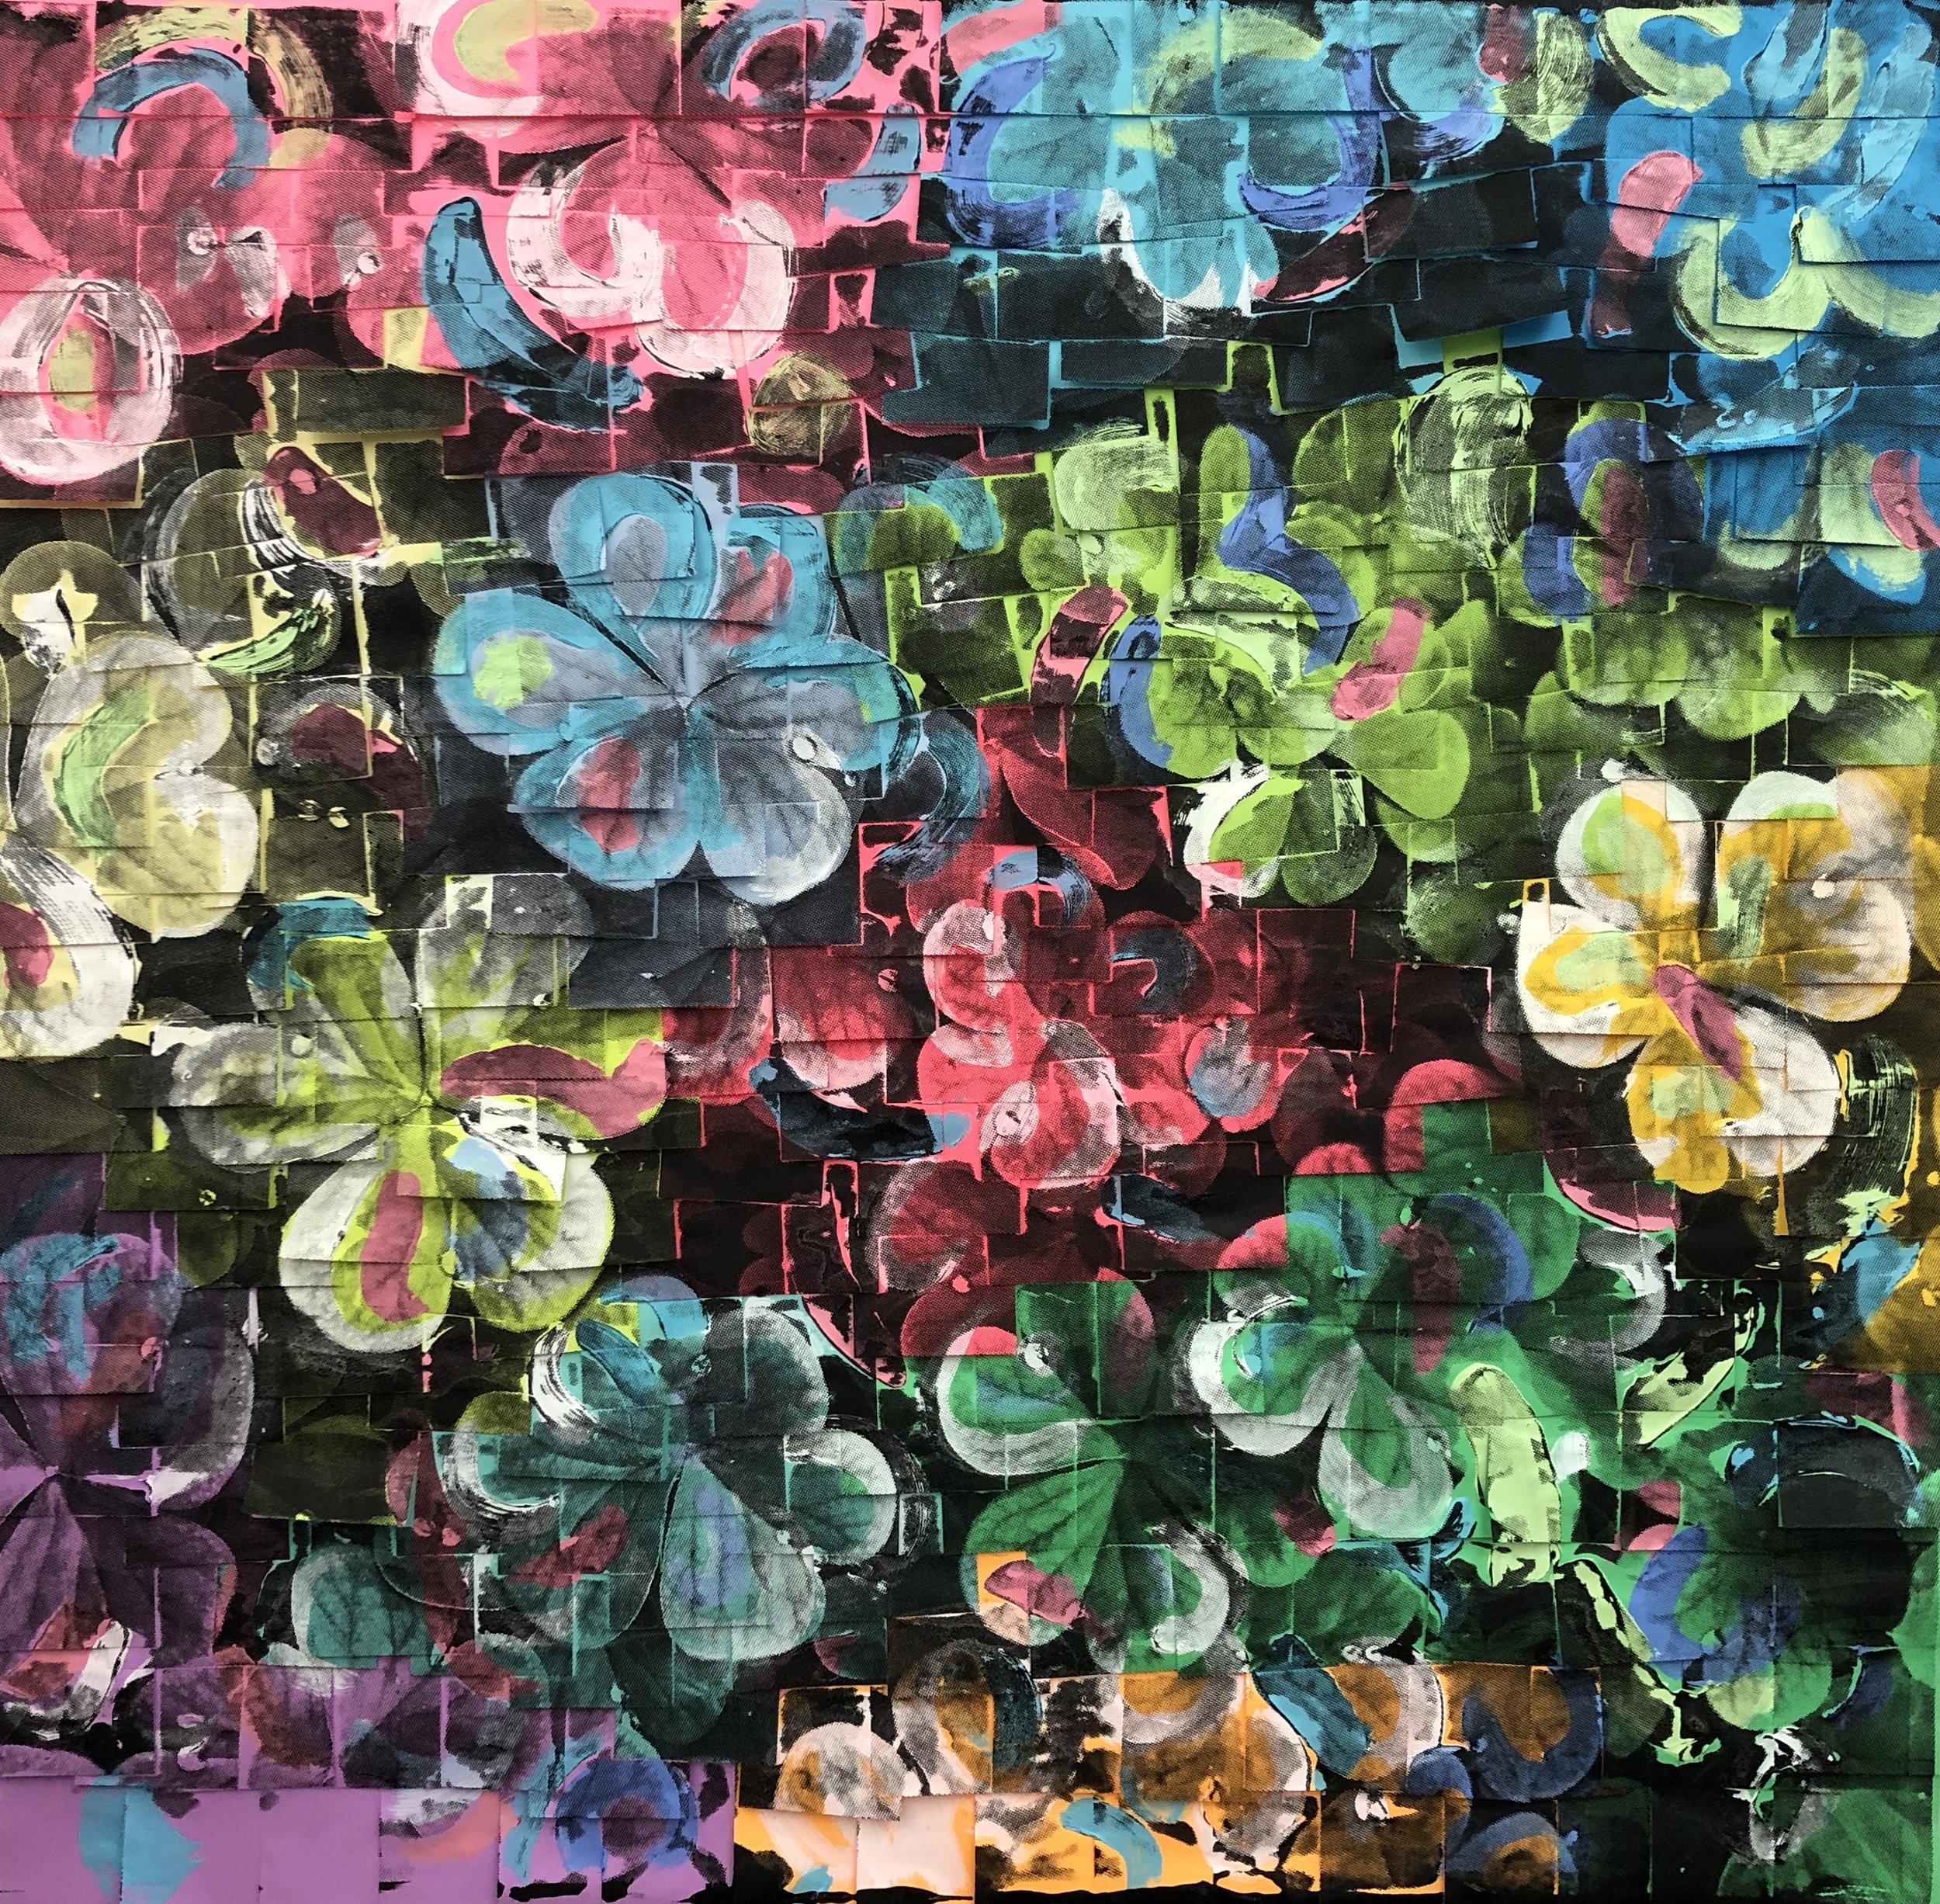 Anna Laudel Gallery, Ardan Özmenoglu, Good Luck, 2019, Painting and screen printing on post-it notes, 36x36in.jpg